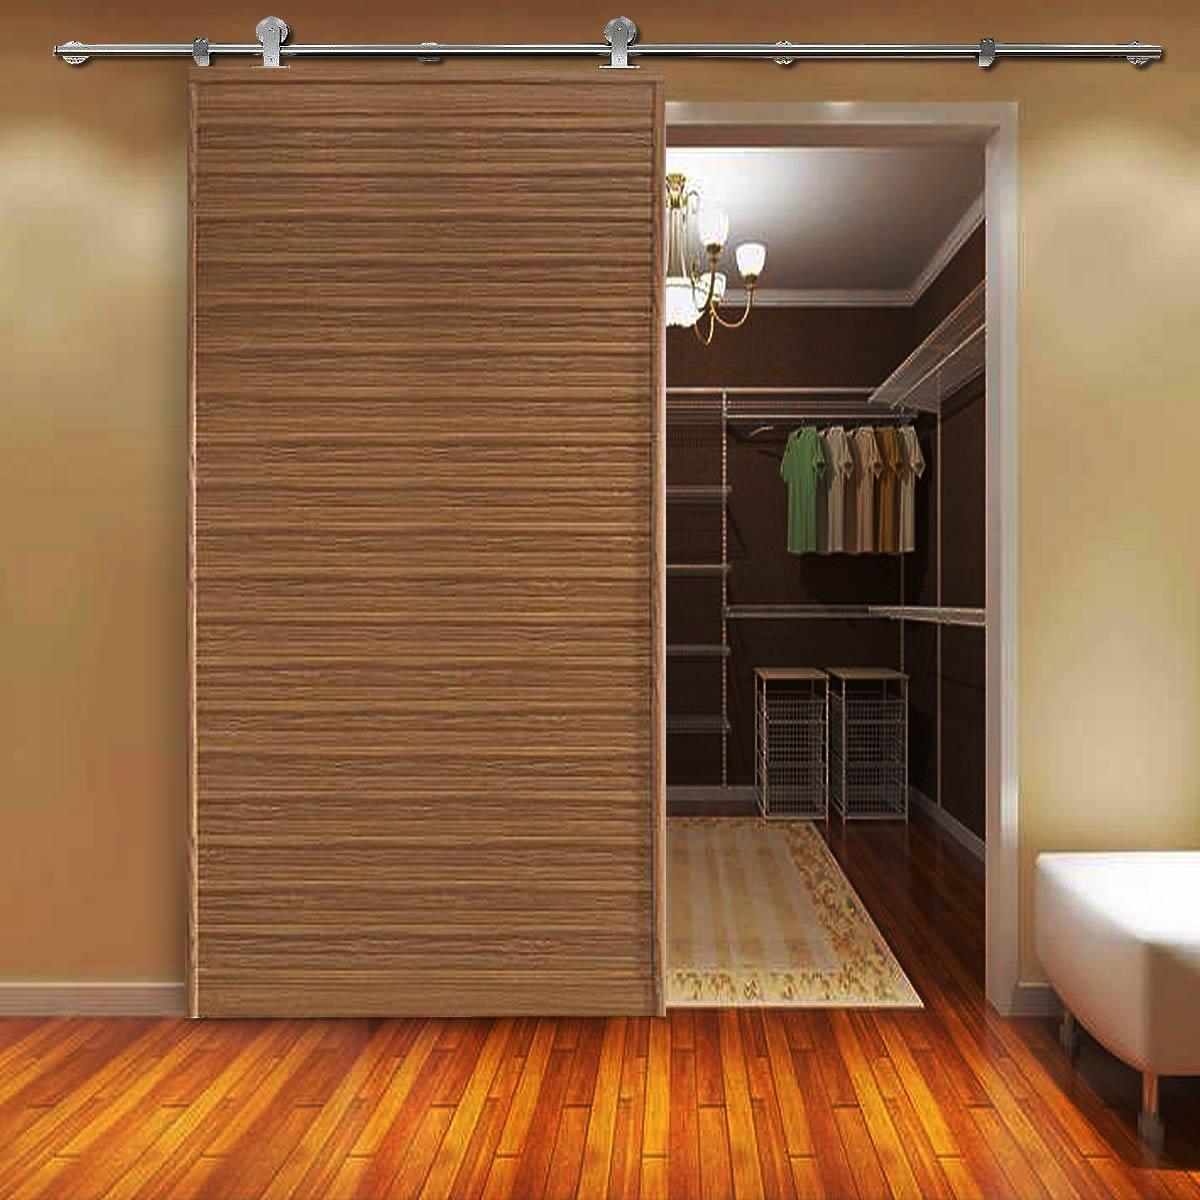 Stainless Steel Sliding Barn Wooden Door Hardware Track(8ft Single Door Kit) by SunGive (Image #5)